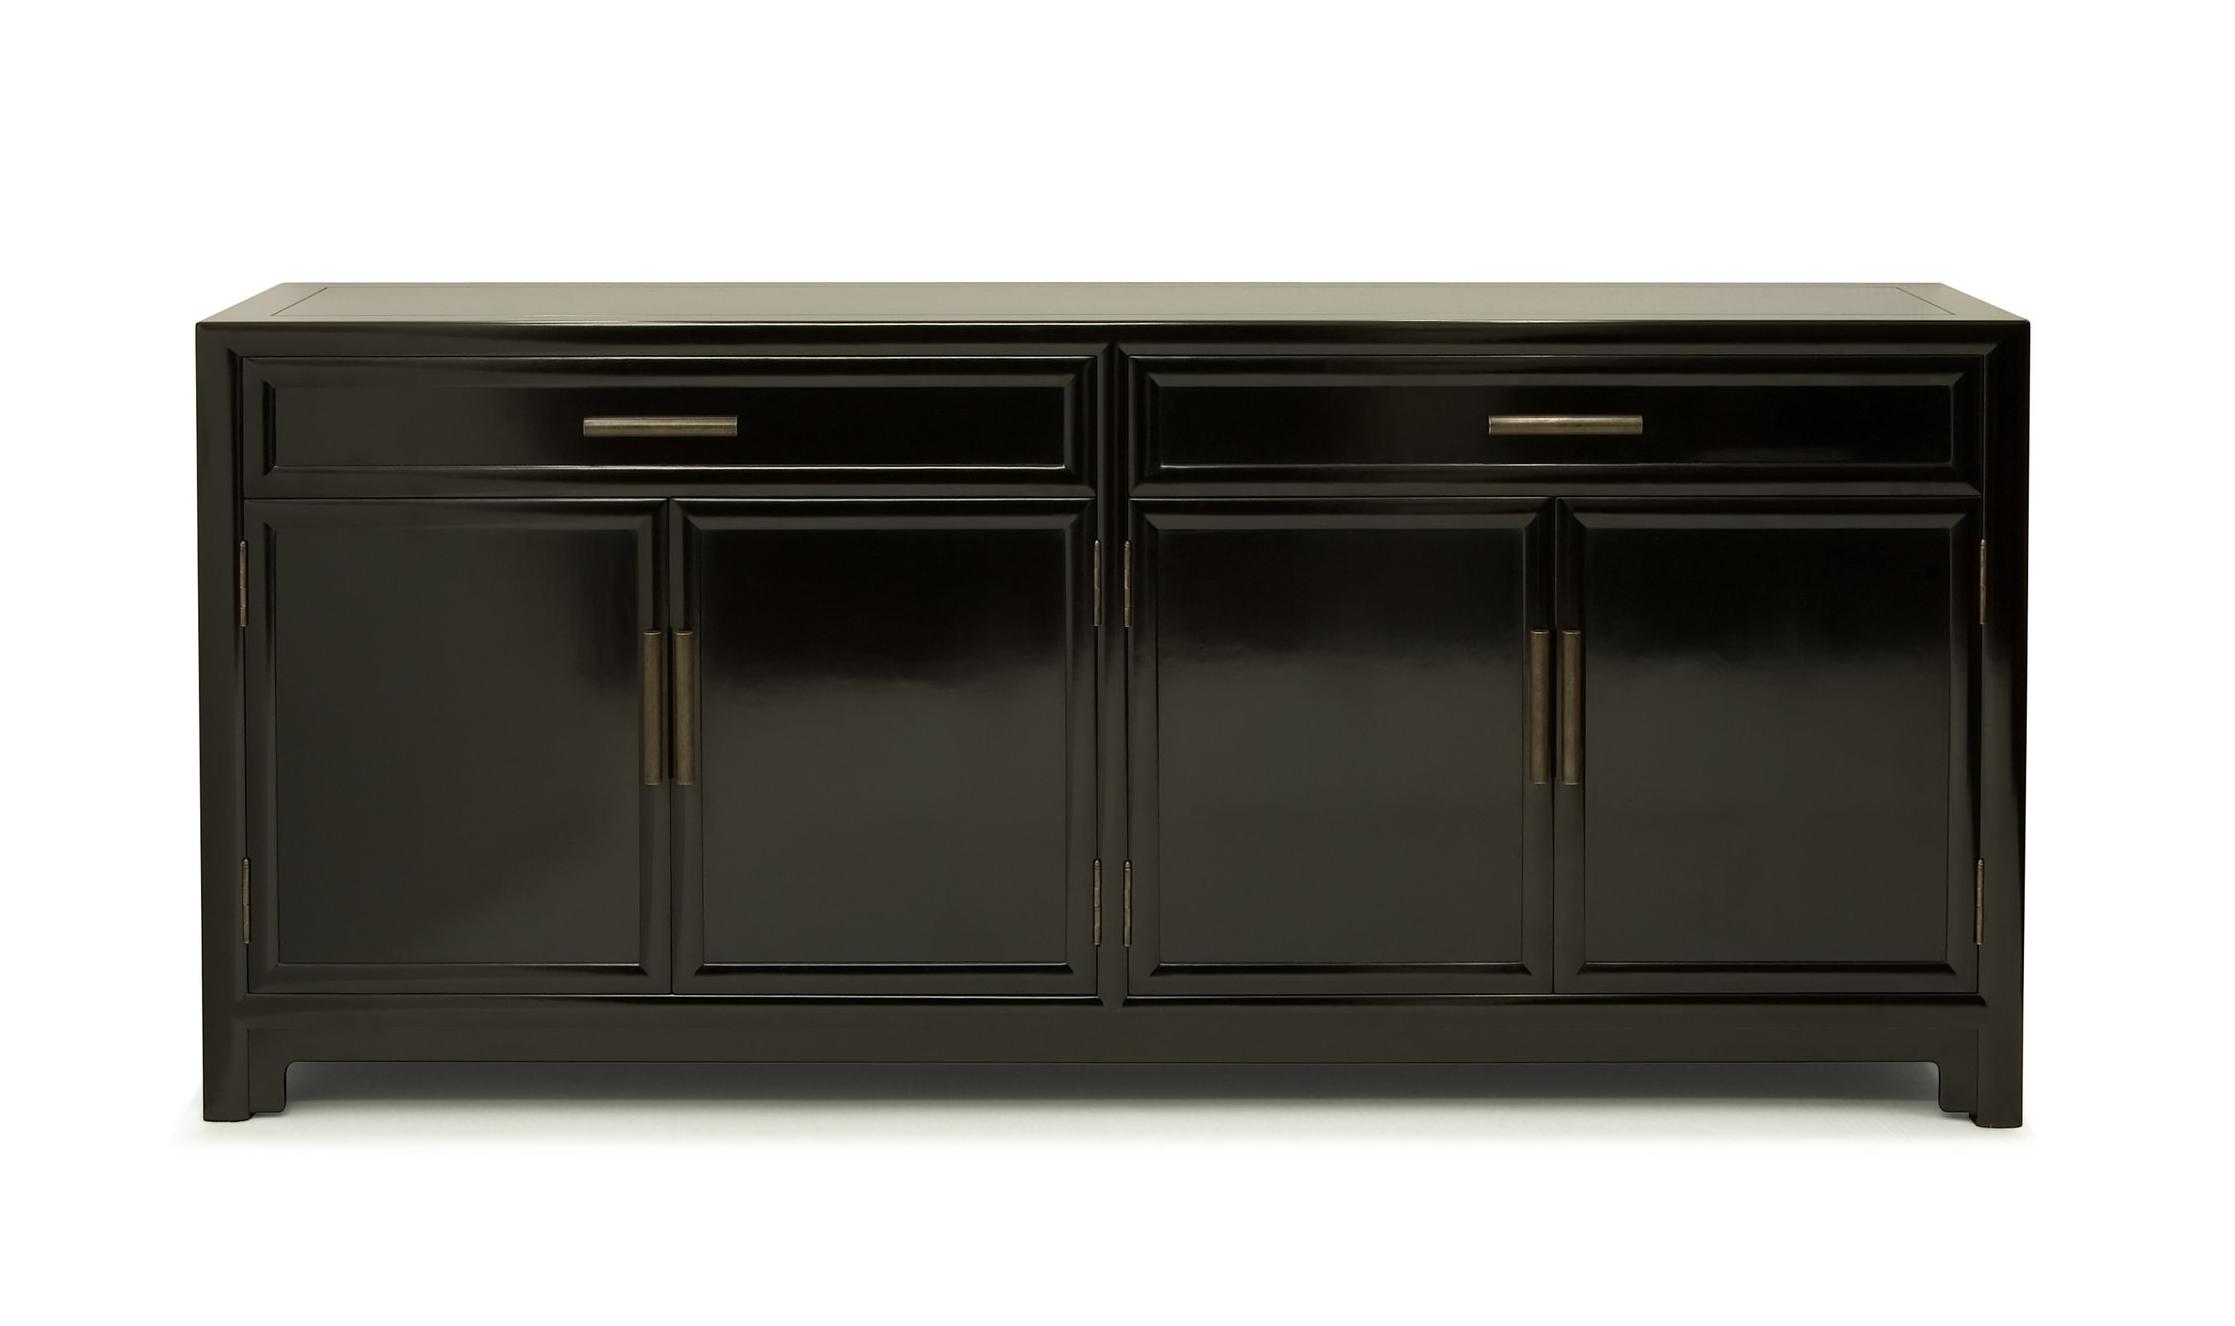 ....Custom made Ming Style Chinese furniture : Cabinet..特别定制明式中式家具:柜....